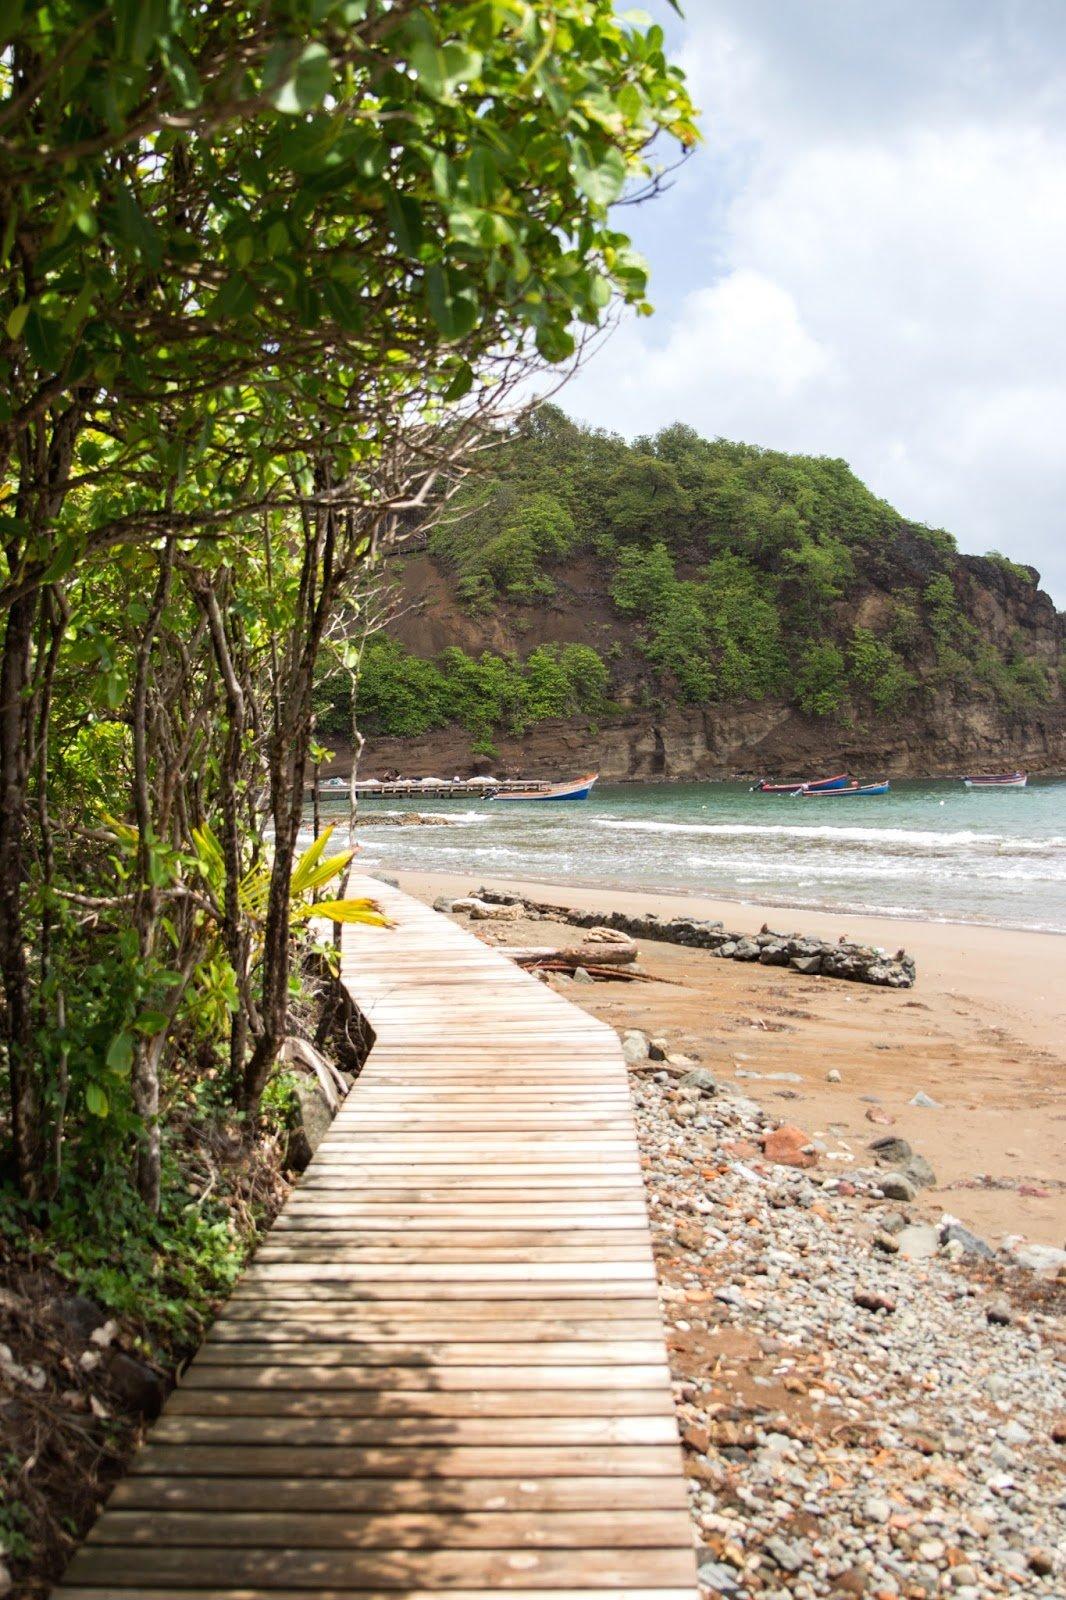 îlet Sainte Marie Nord de la Martinique